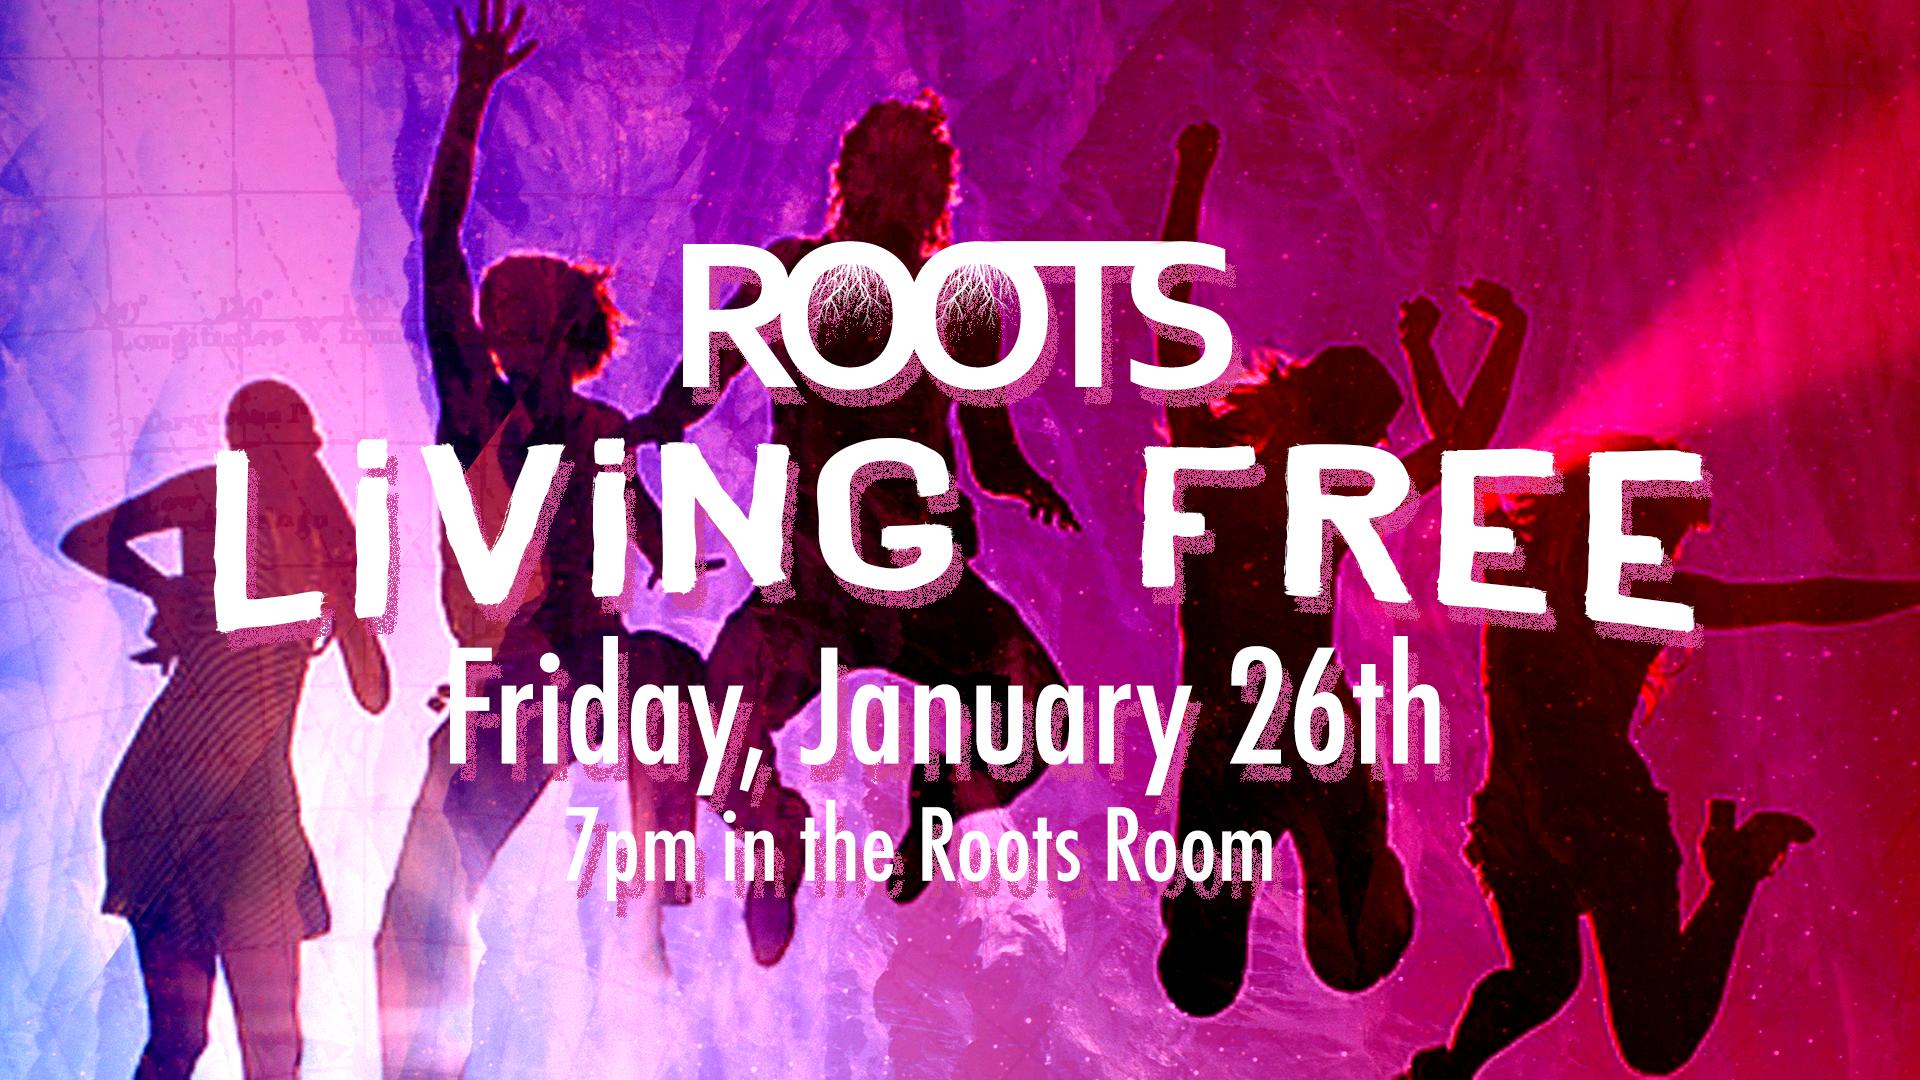 Roots_living_free.jpg